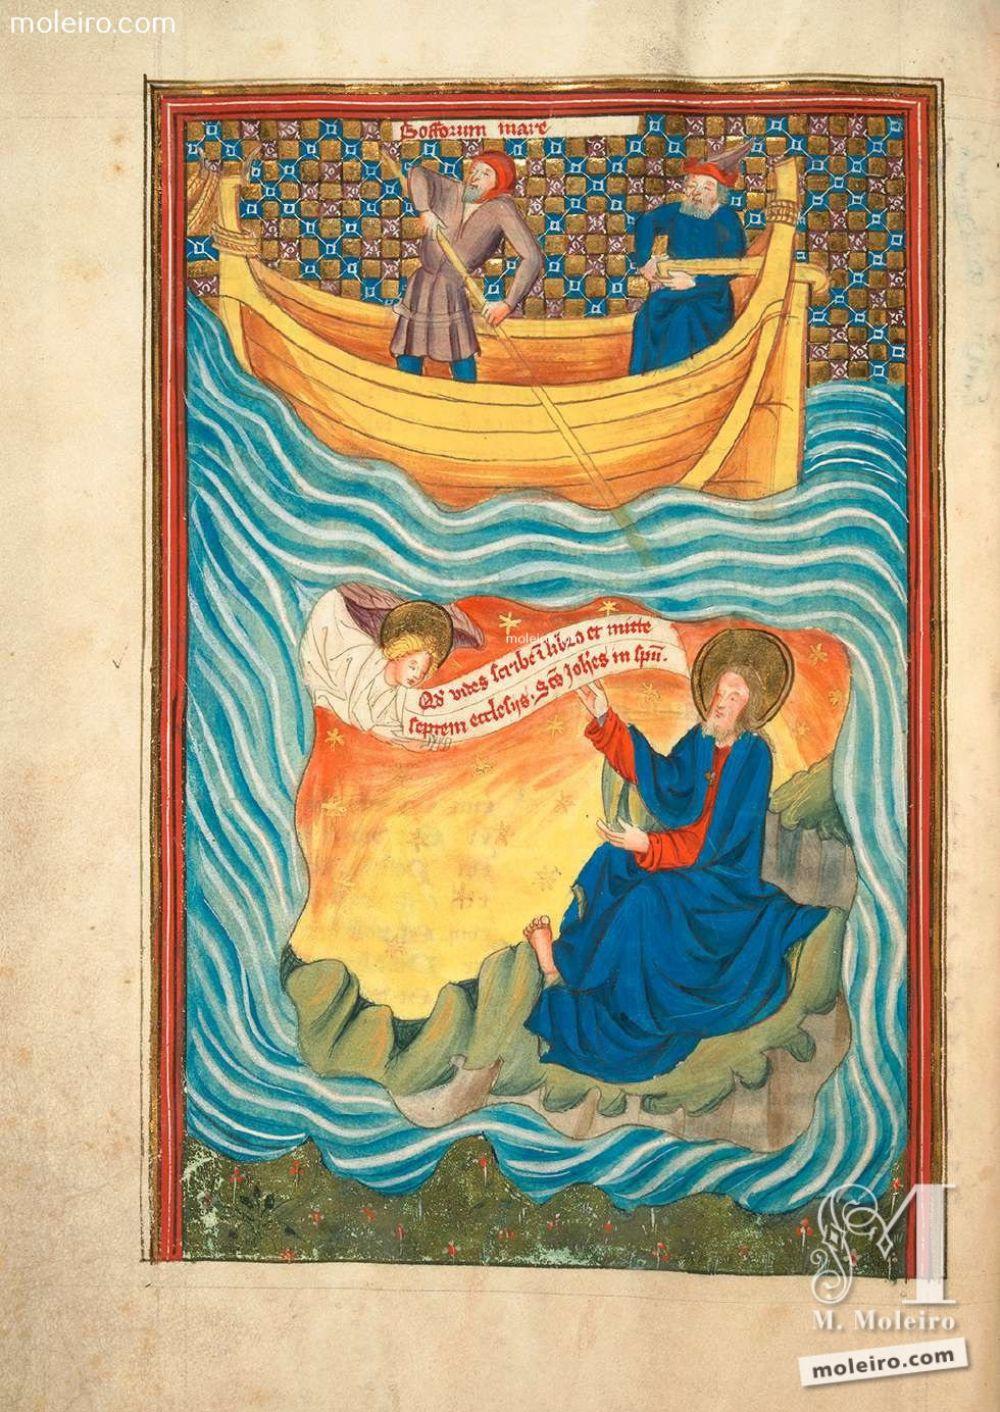 Miniature f. 3v · St. John in Patmos. The angel reveals to St. John the Apocalypse. Apocalypse Saint John. Illuminated manuscript from the XVth century